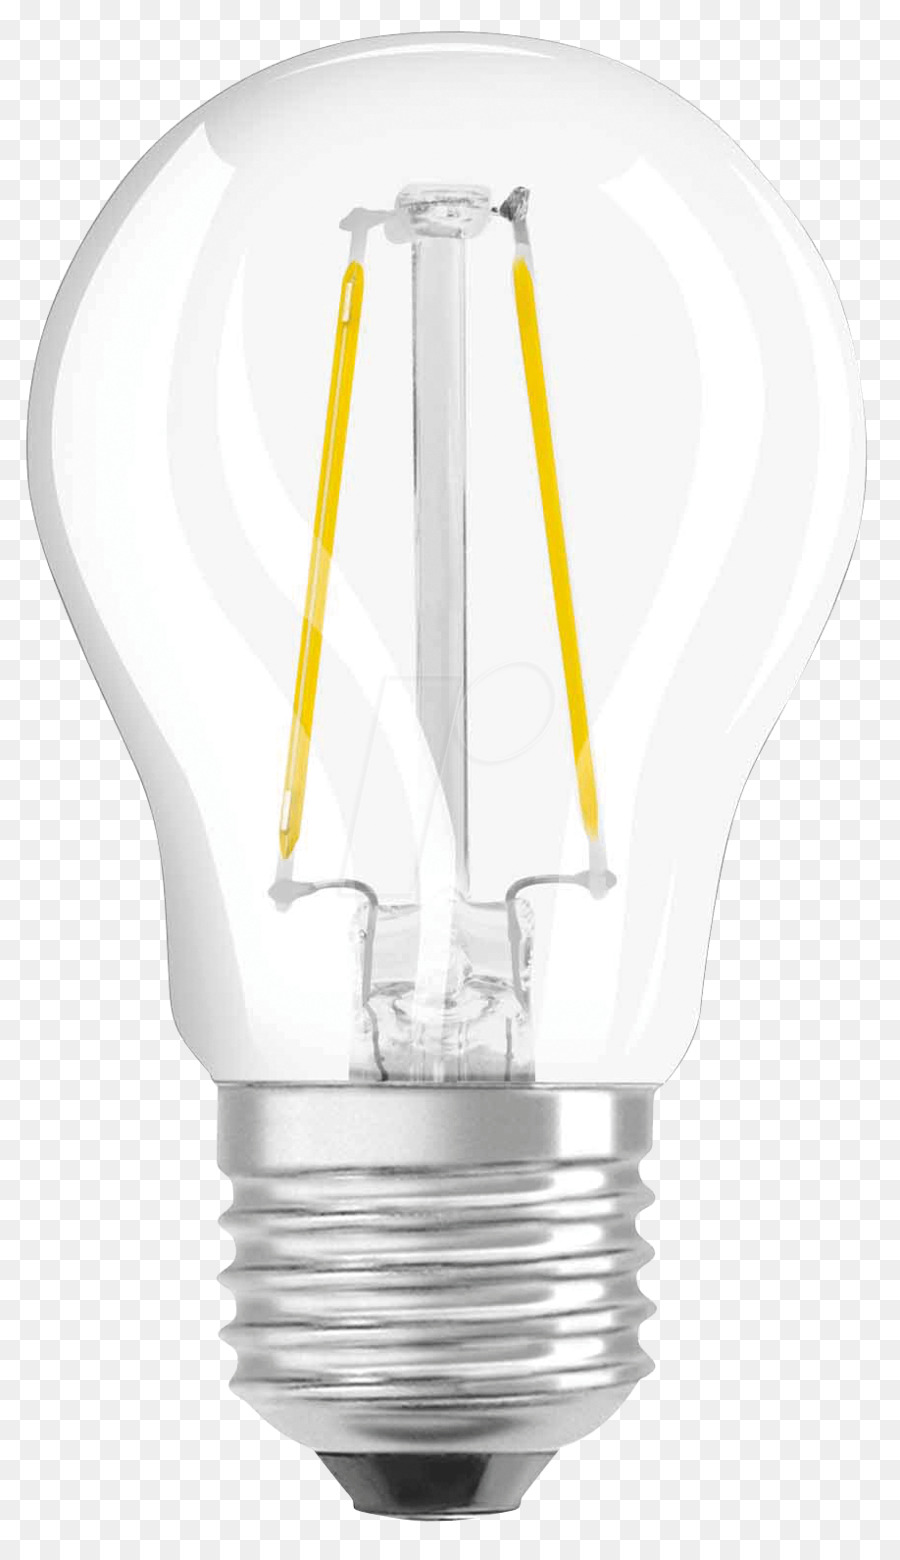 Led Lampe Led Filament Osram Vis Edison Lampe Telechargement Png